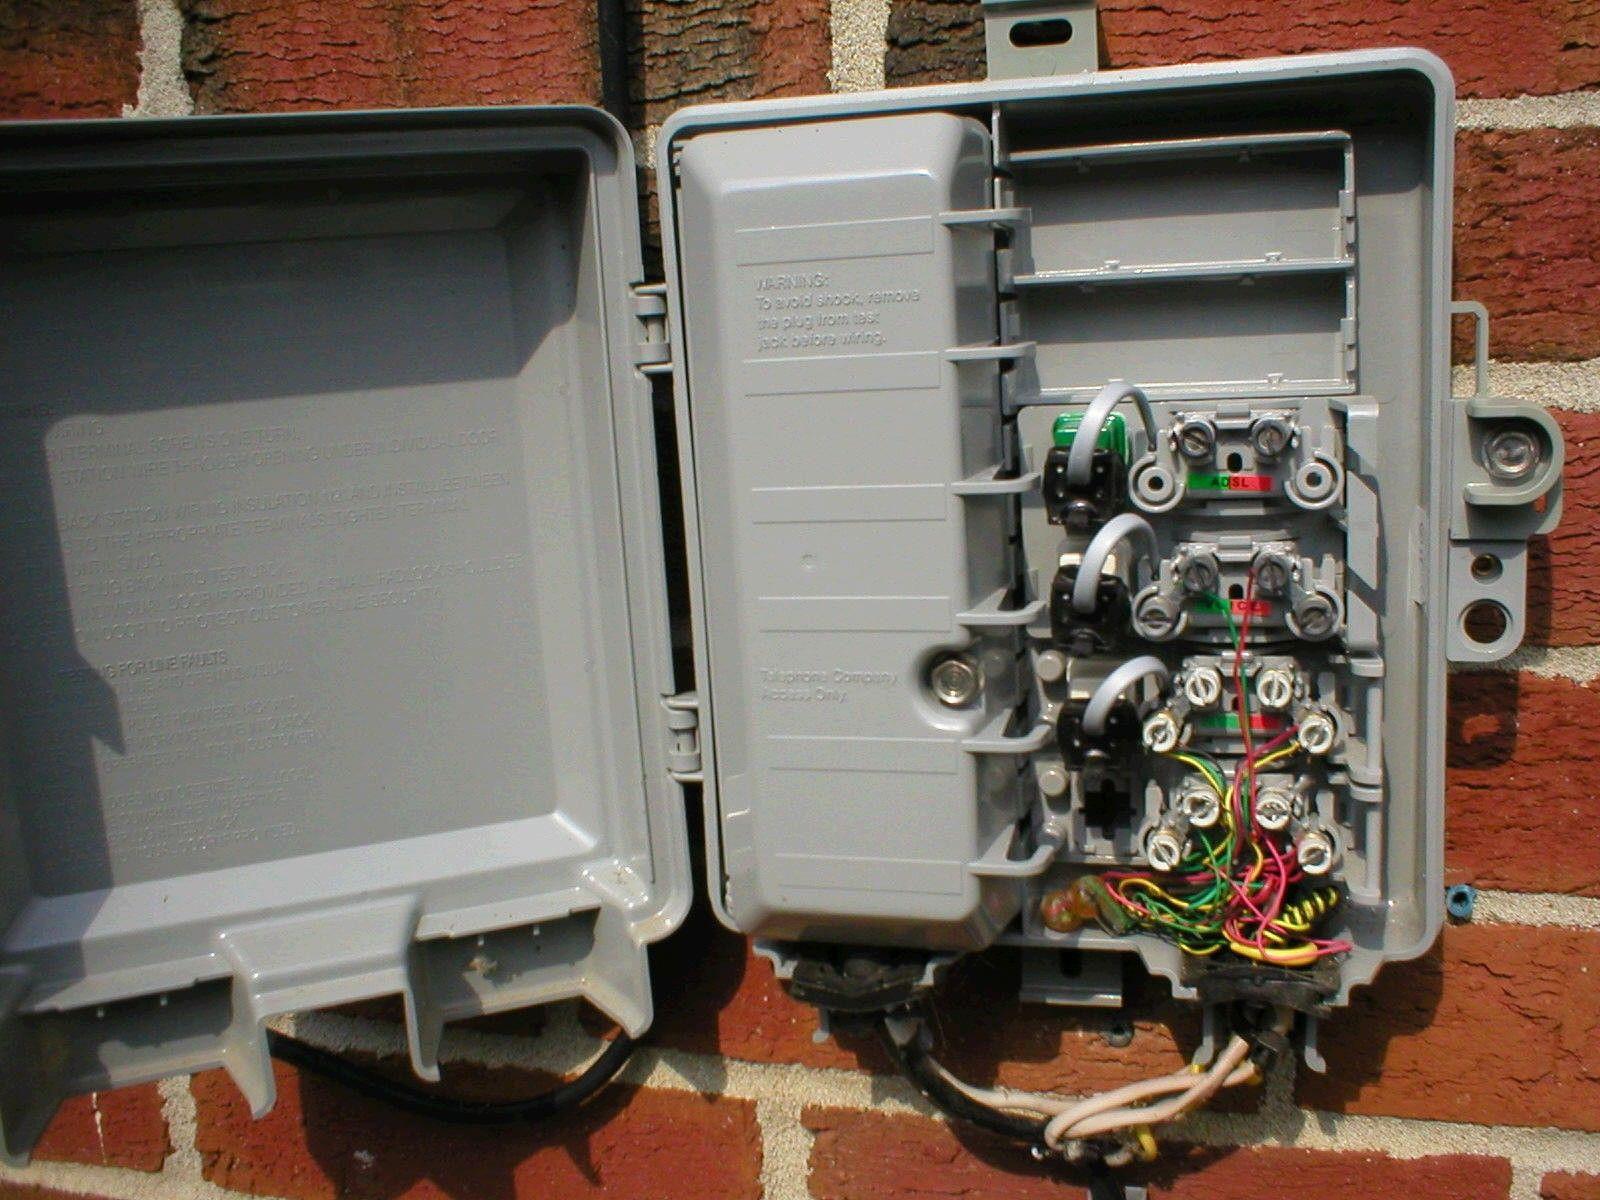 New Wiring Diagram For Bt Master Socket Diagrams Digramssample Diagramimages Wiringdiagramsample Wiringdiagram Sockets Home Appliances